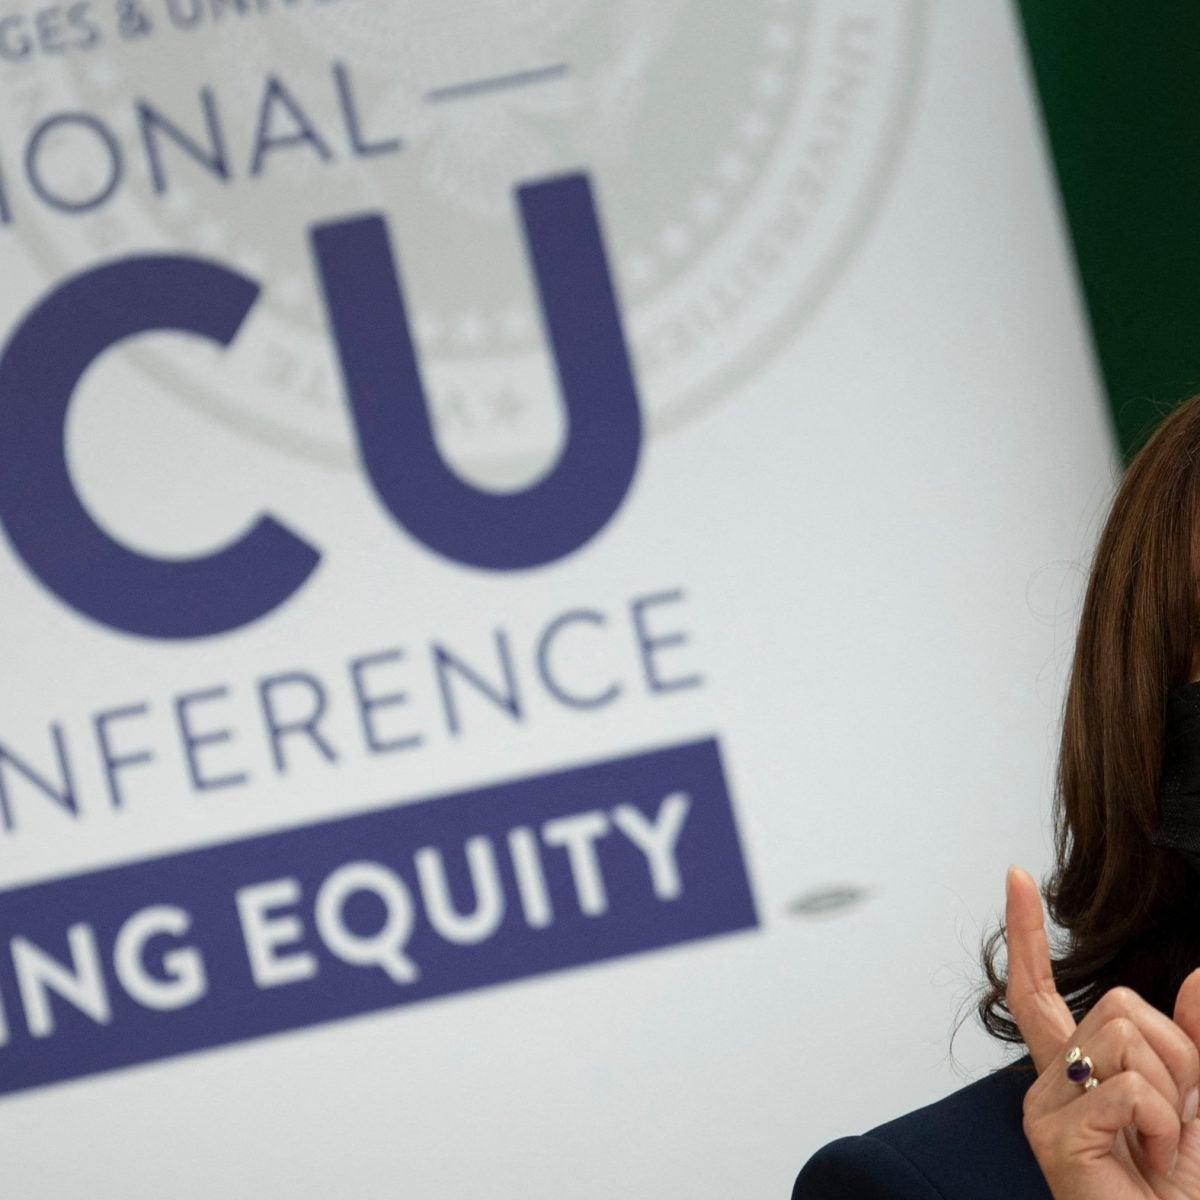 Vice President Kamala Harris Visits Hampton University in Virginia